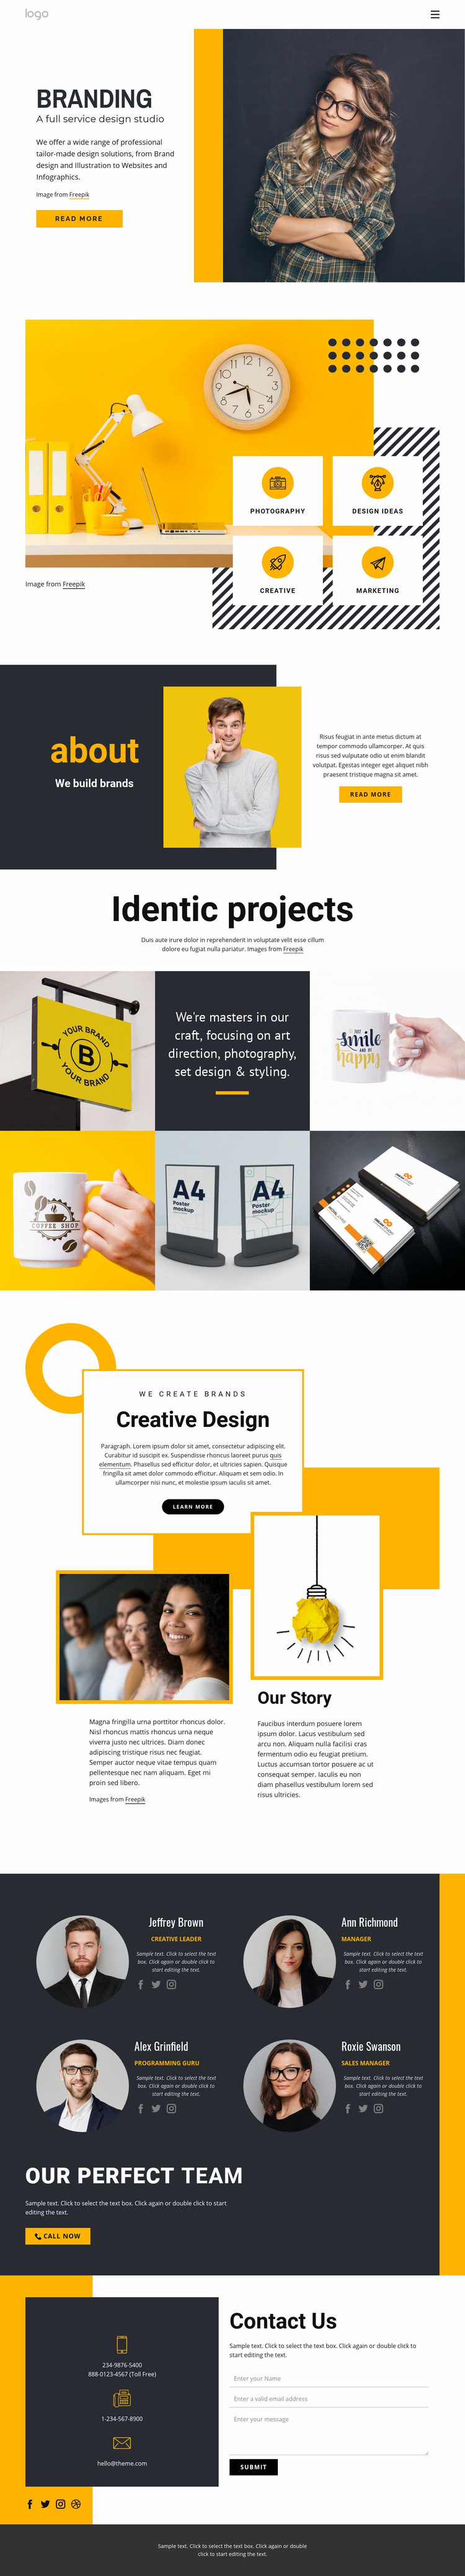 Full-service design studio WordPress Website